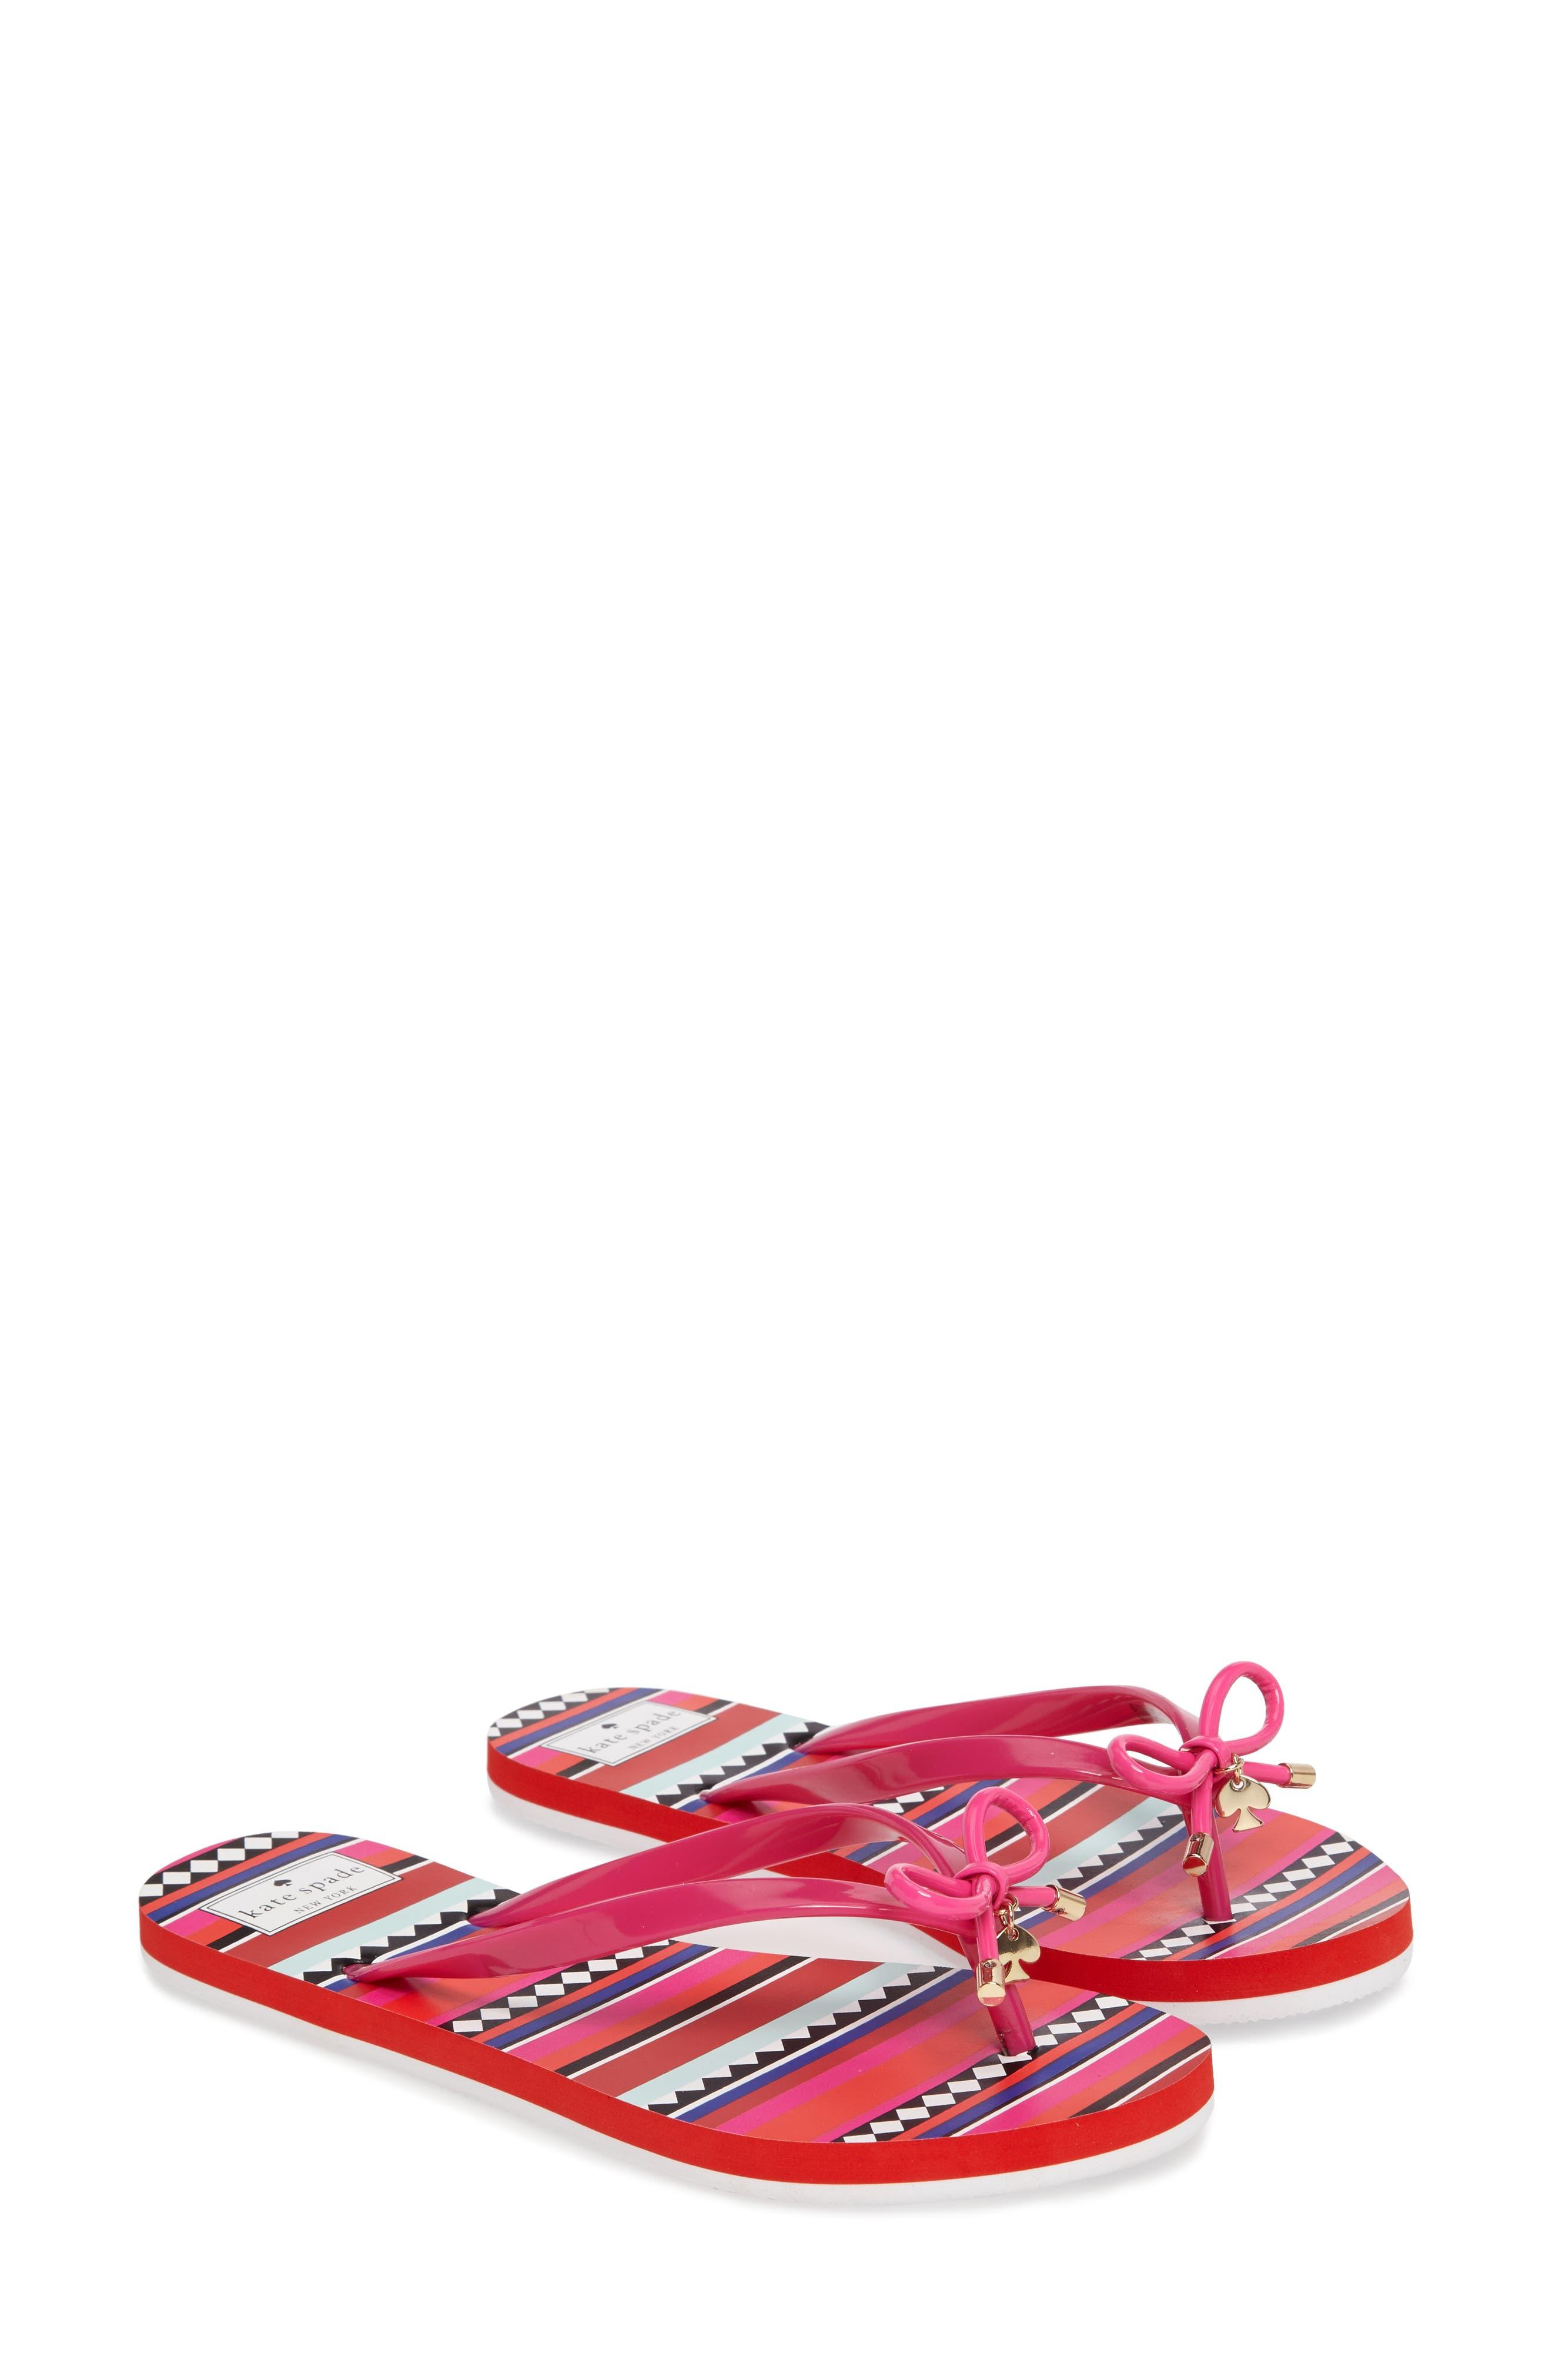 Main Image - kate spade new york 'nova' flip flop (Women)